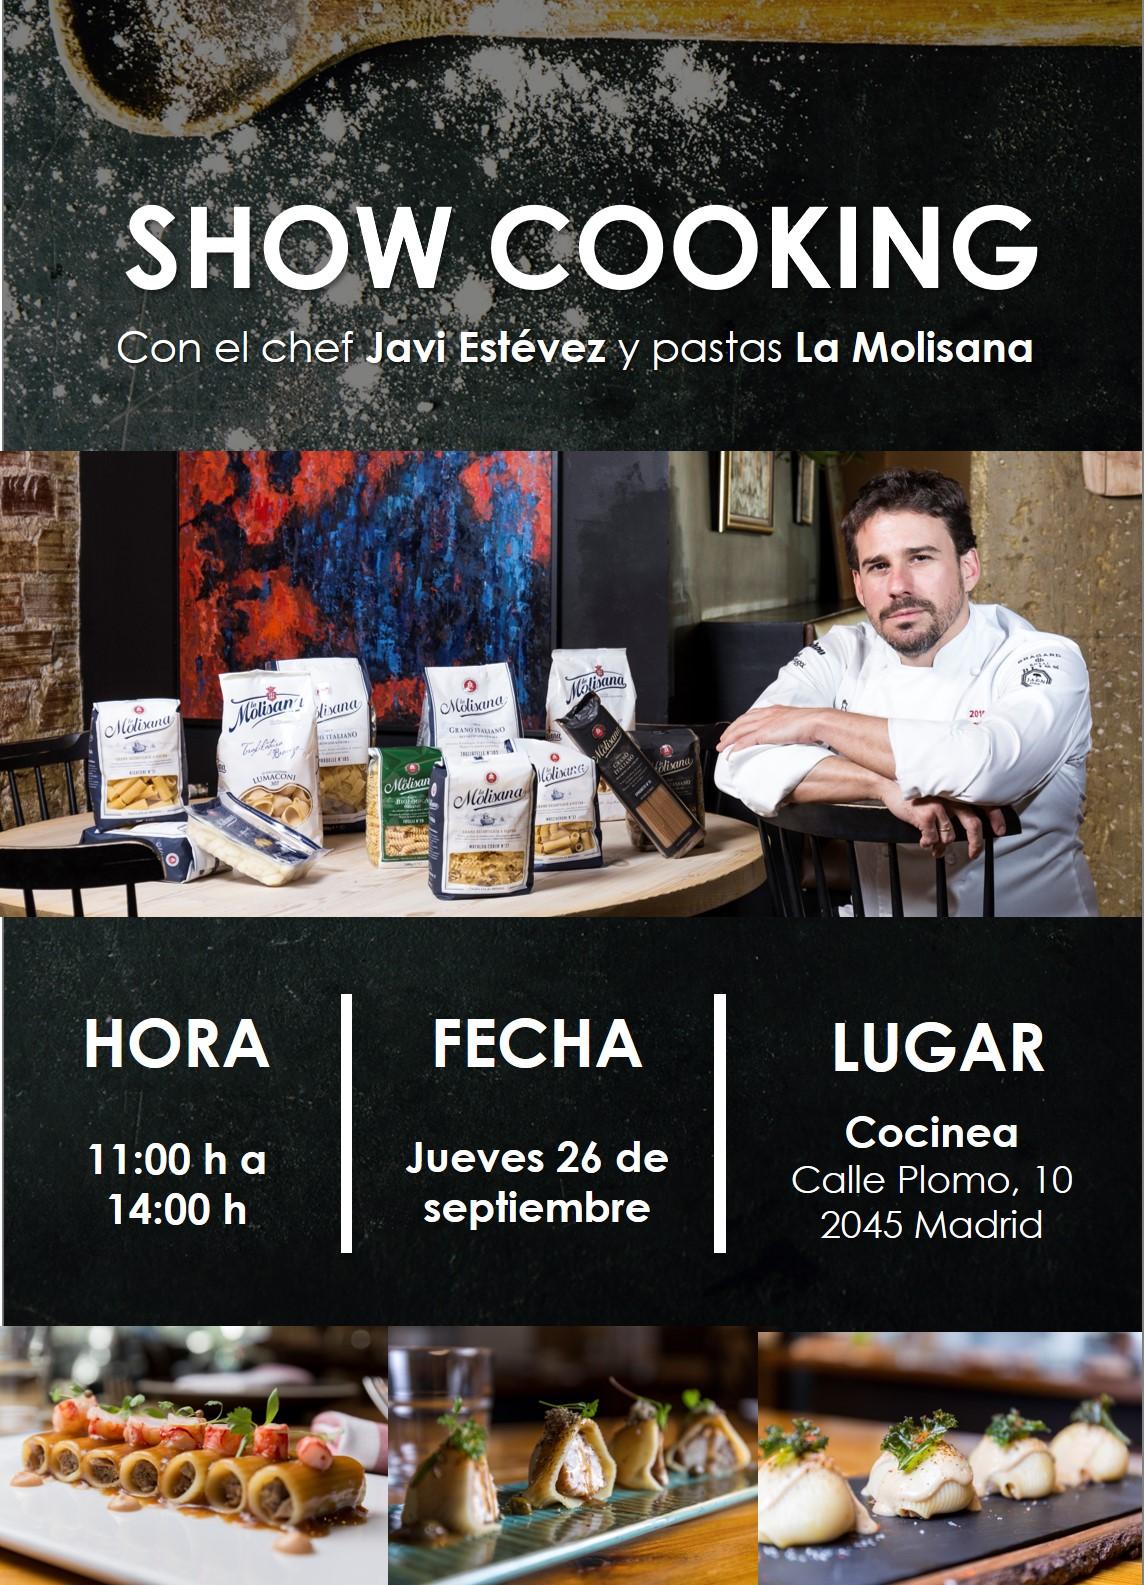 Show Cooking del Chef Javi Estévez con La Molisana